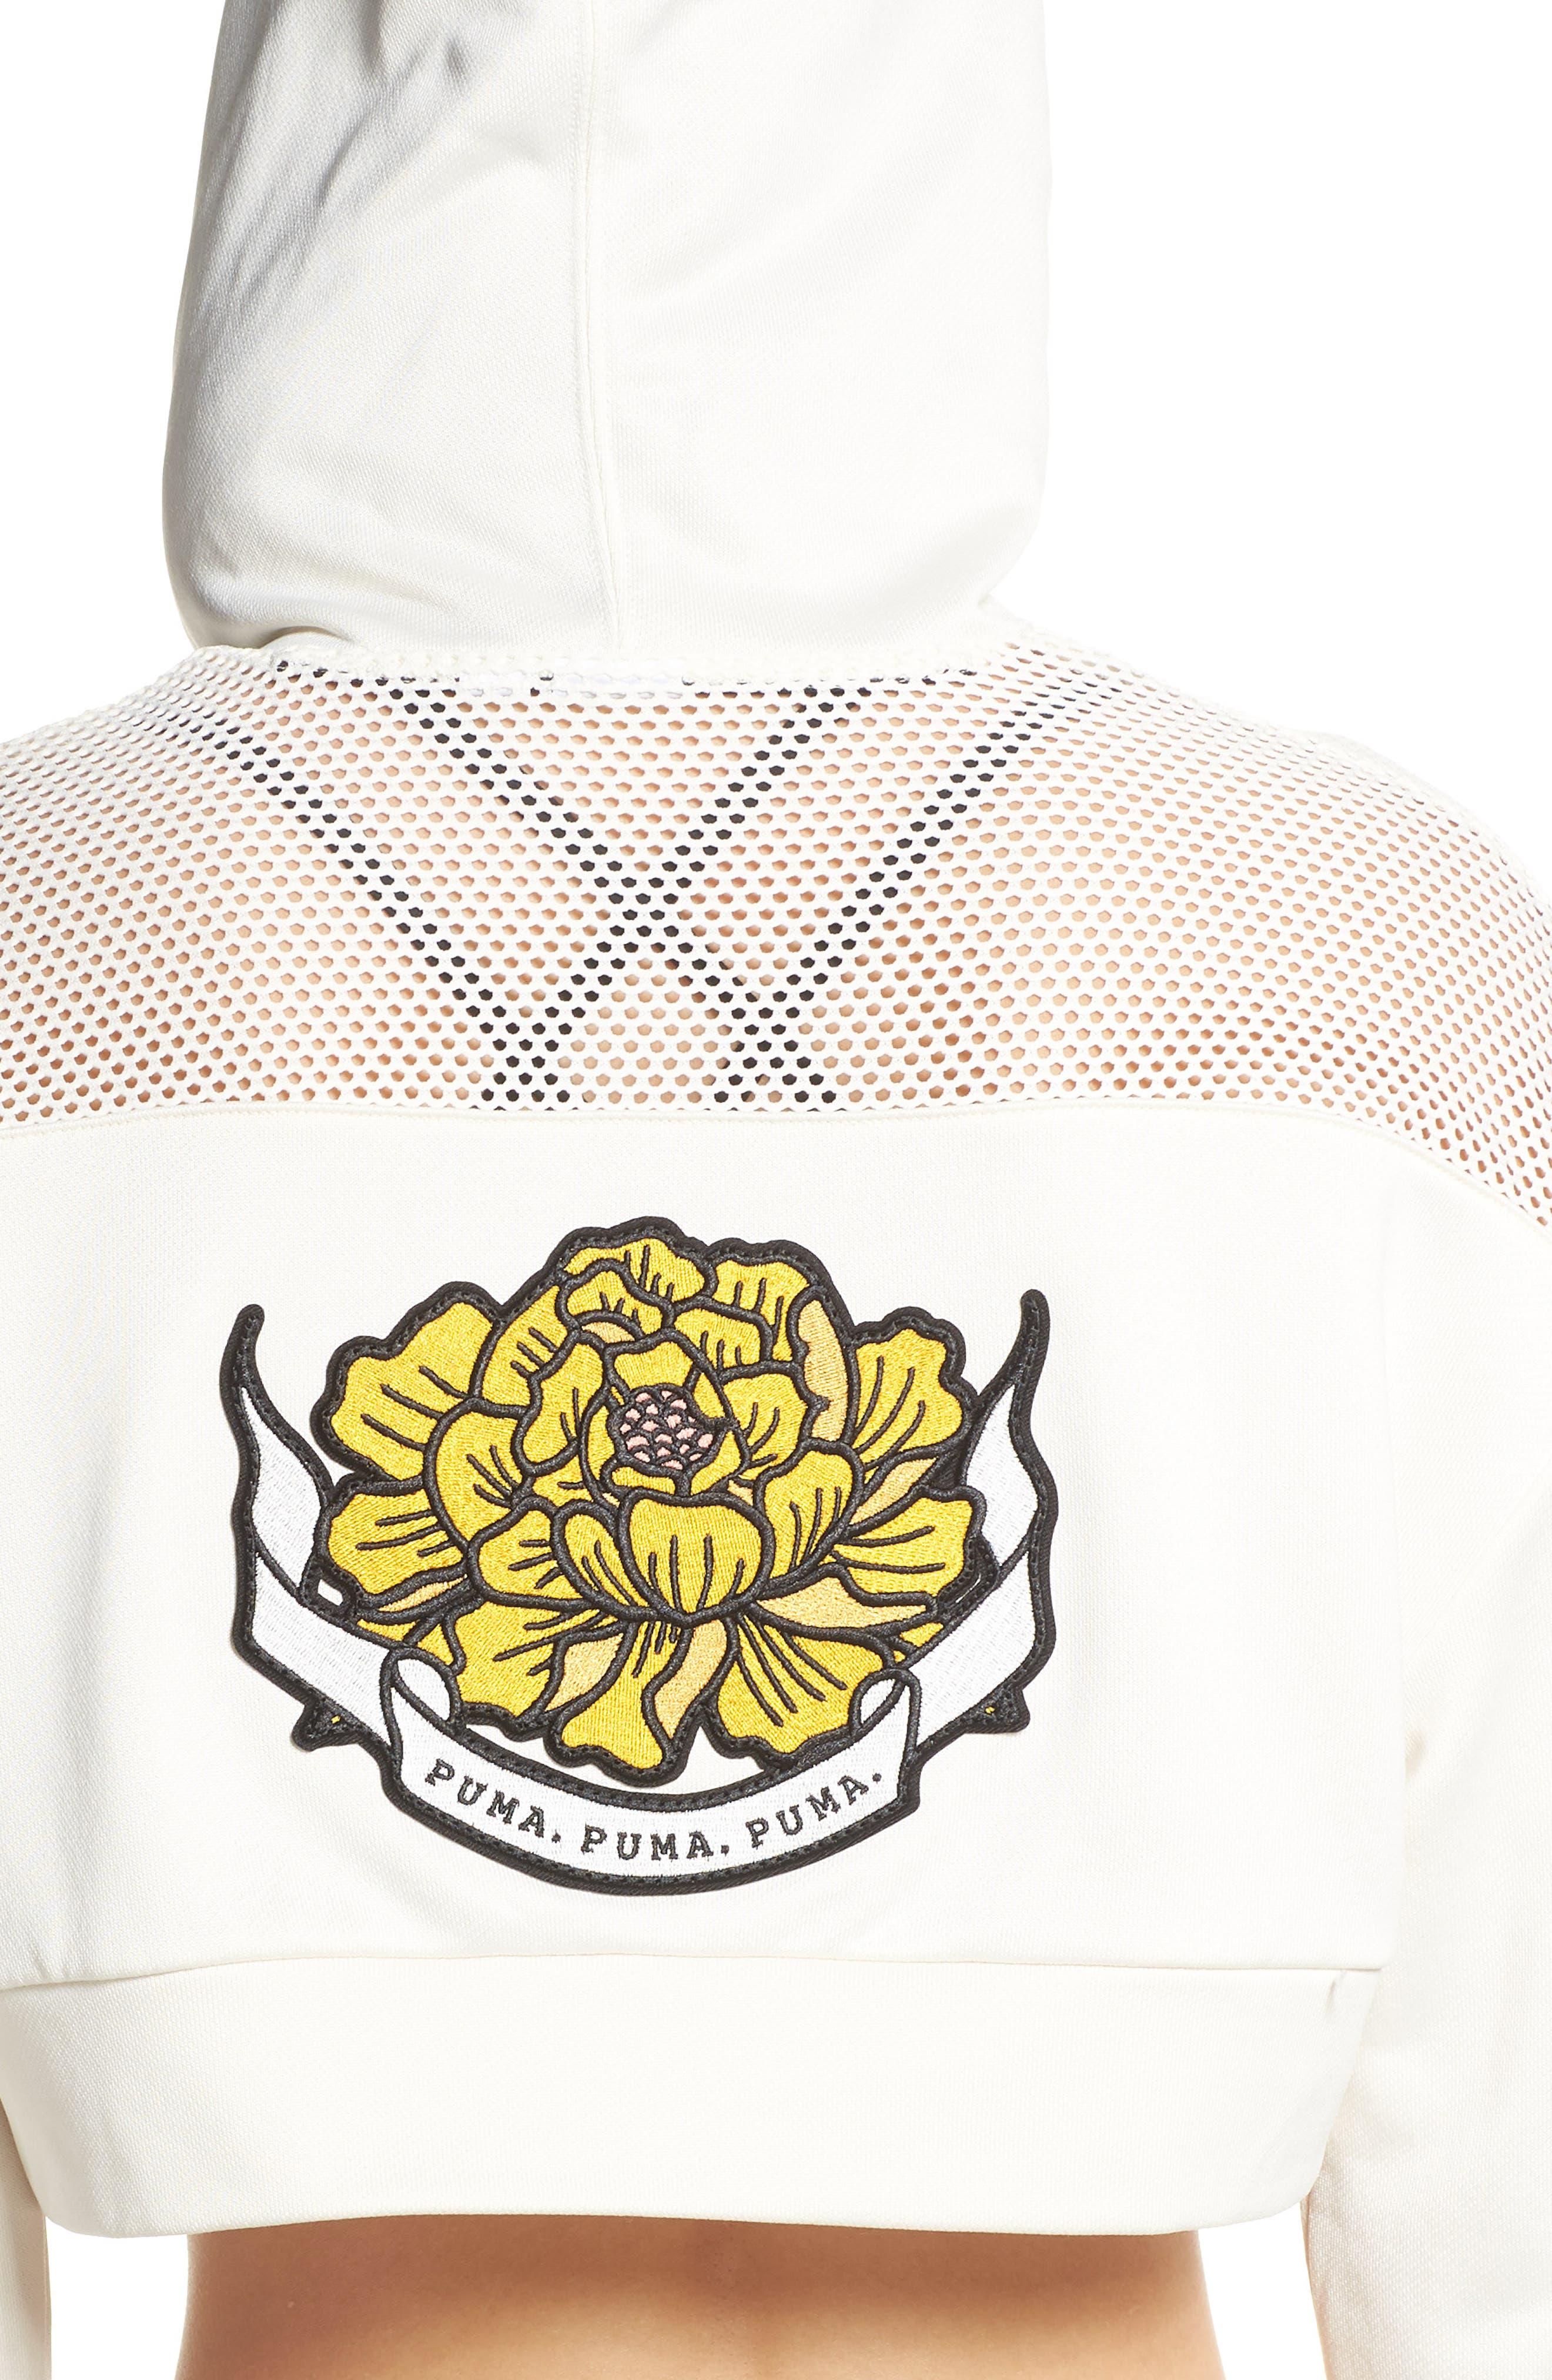 PUMA, Flourish Crop Hooded Sweatshirt, Alternate thumbnail 5, color, WHISPER WHITE-PUMA BLACK